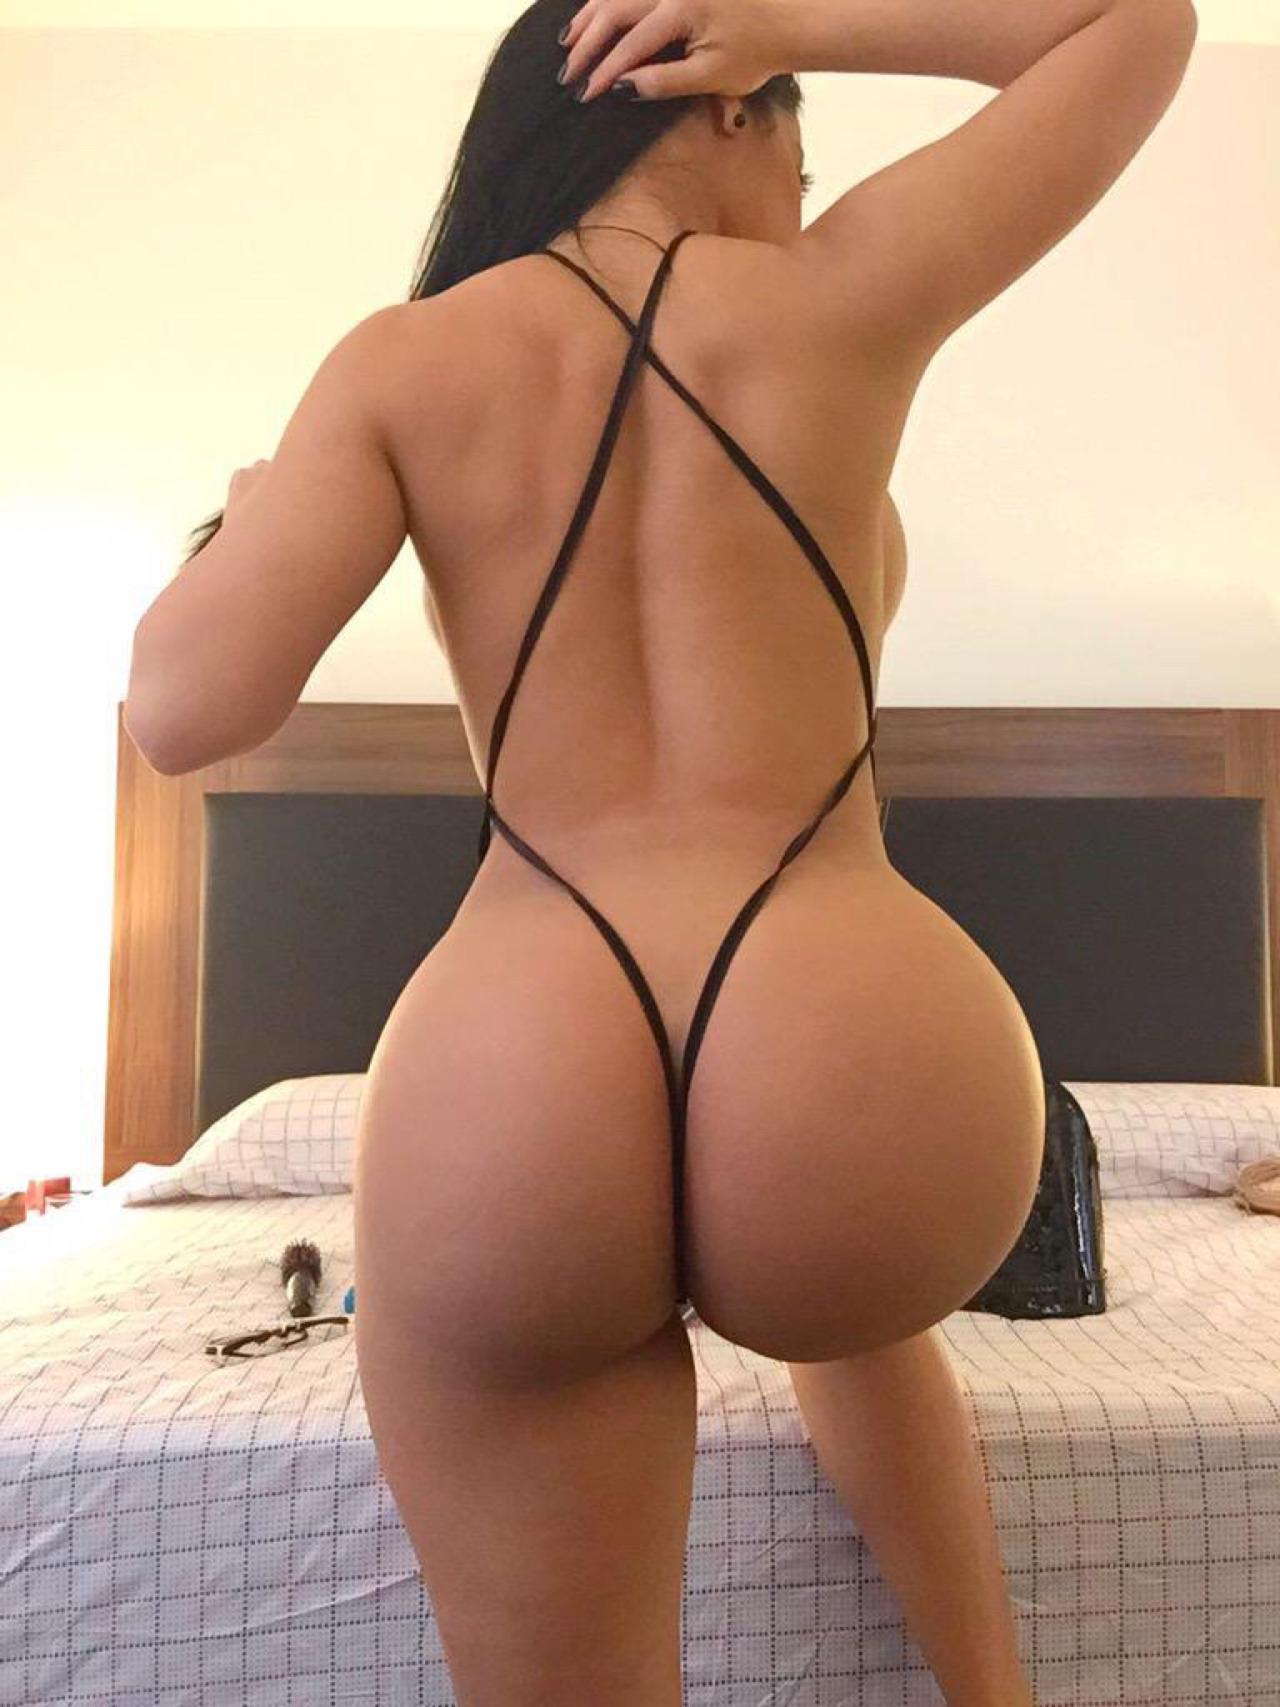 Bad ass ladies